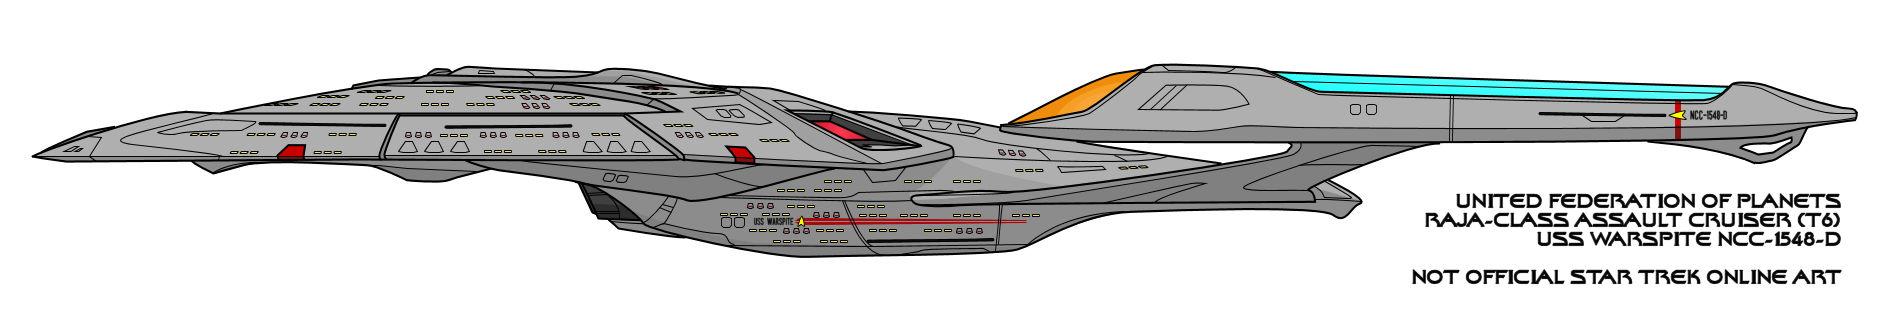 Star Trek Online: Grand Old Lady